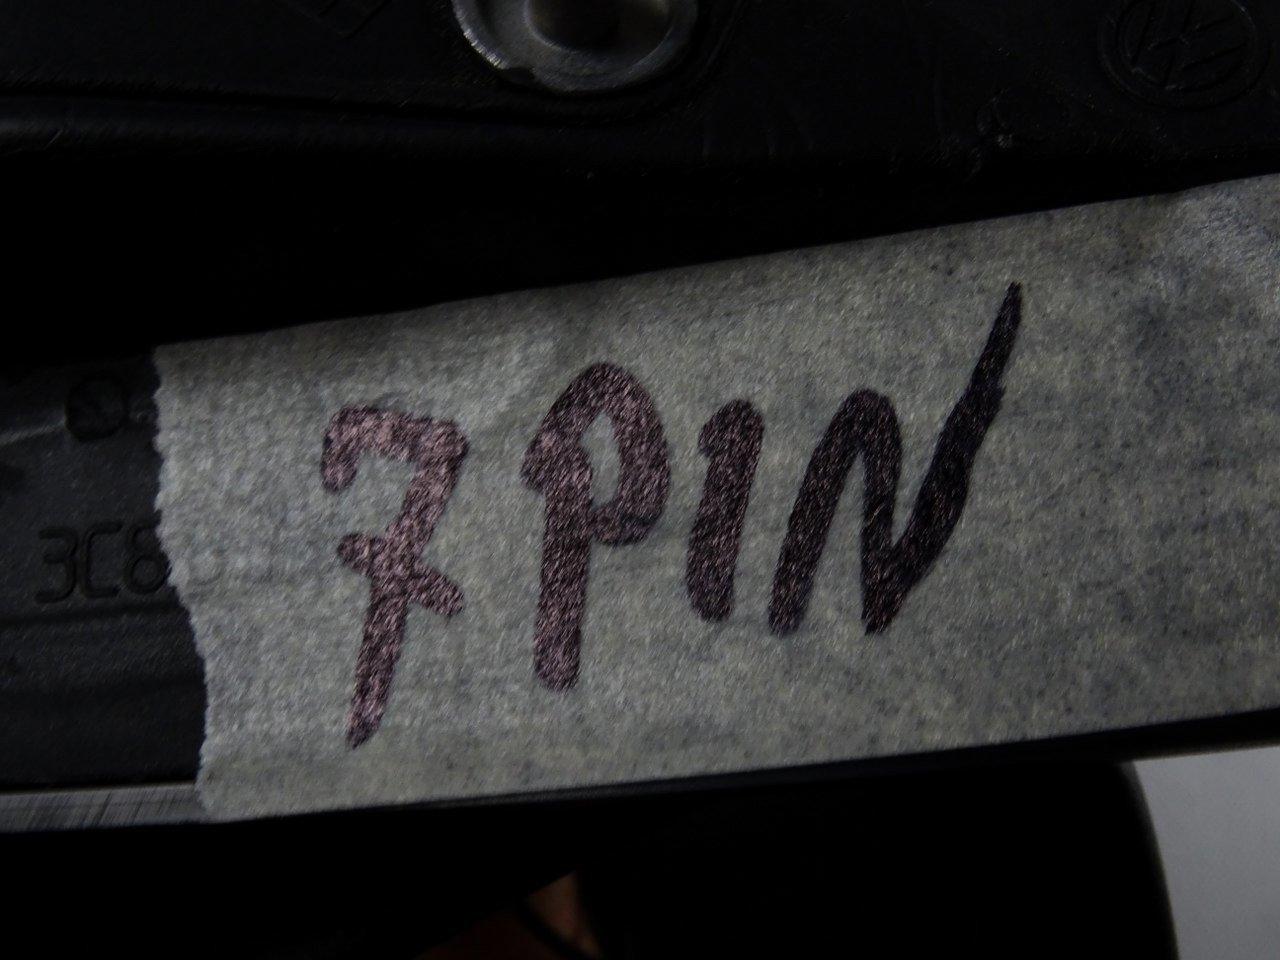 Berühmt Anhängerkupplung Schaltplan 4 Pin Bilder - Schaltplan Serie ...